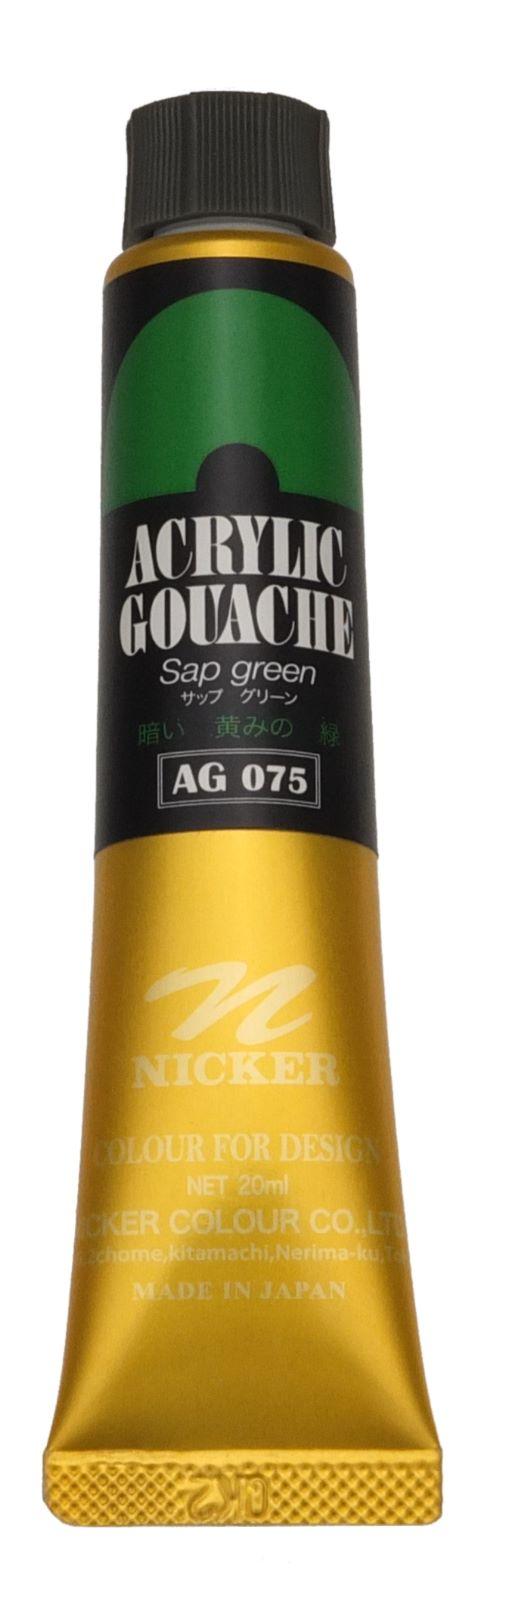 ACRYLIC GOUACHE 20ml AG075 SAP GREEN